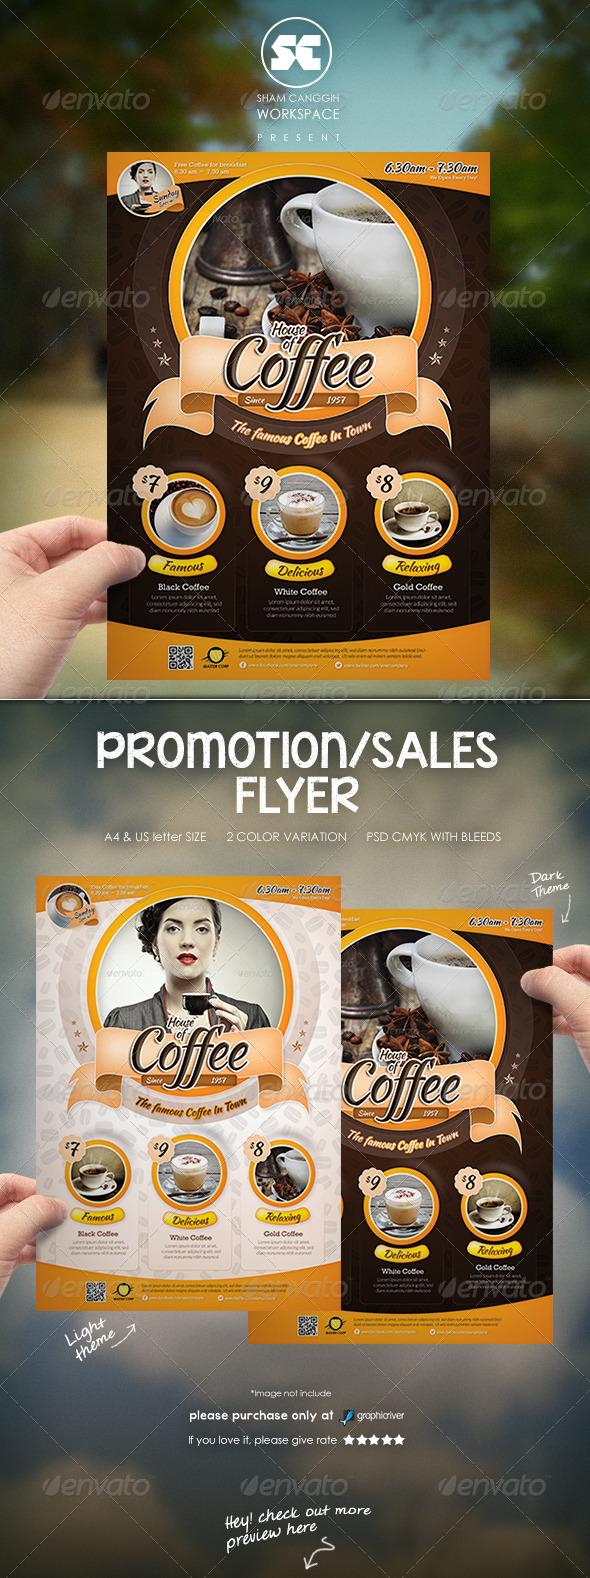 Modern Coffee House Flyer / Magazine Ads - Restaurant Flyers